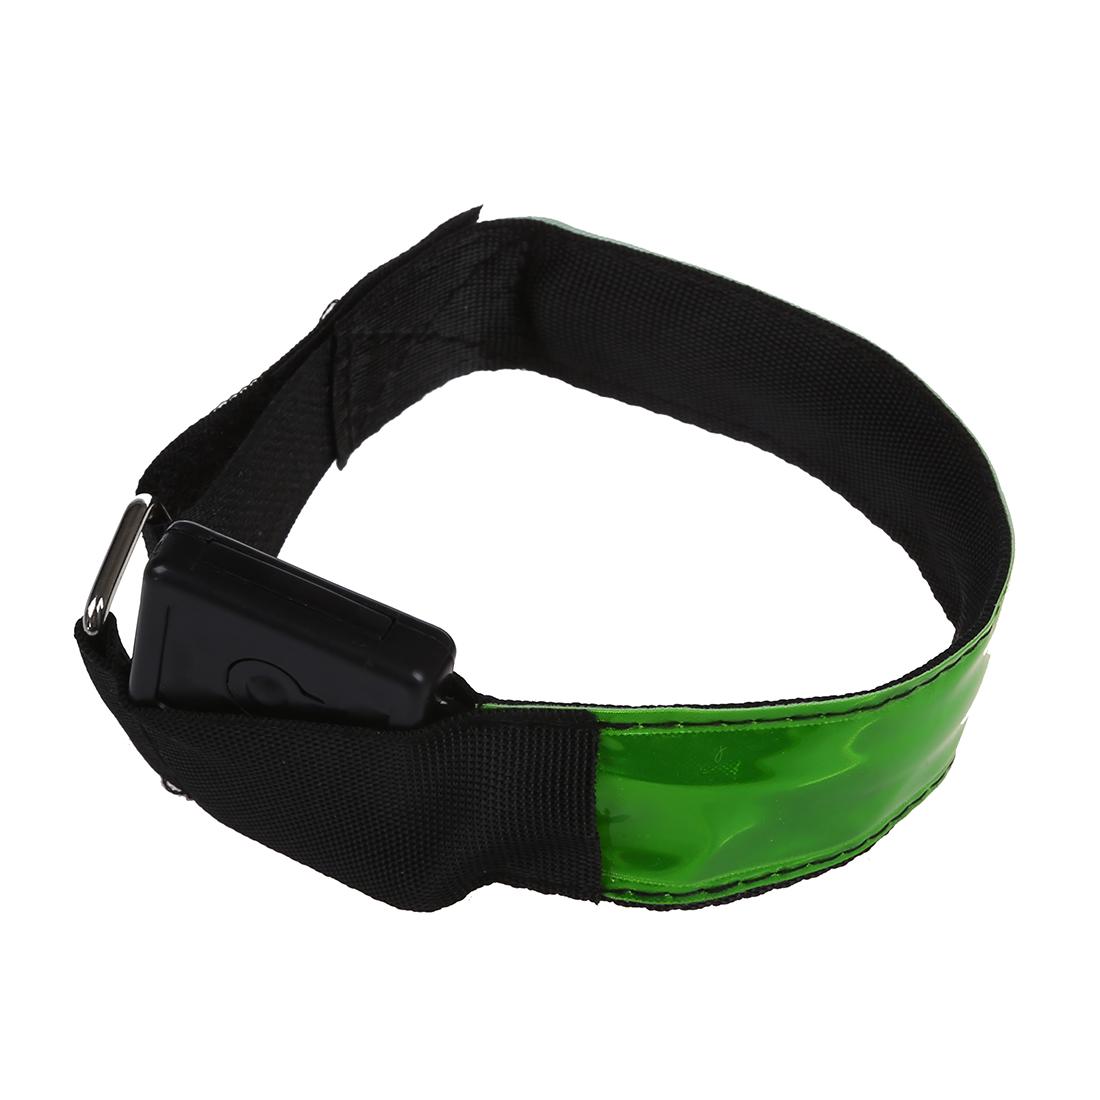 Banda-de-brazo-de-intermitente-LED-reflexivo-ajustable-para-ciclismo-correr-N2M5